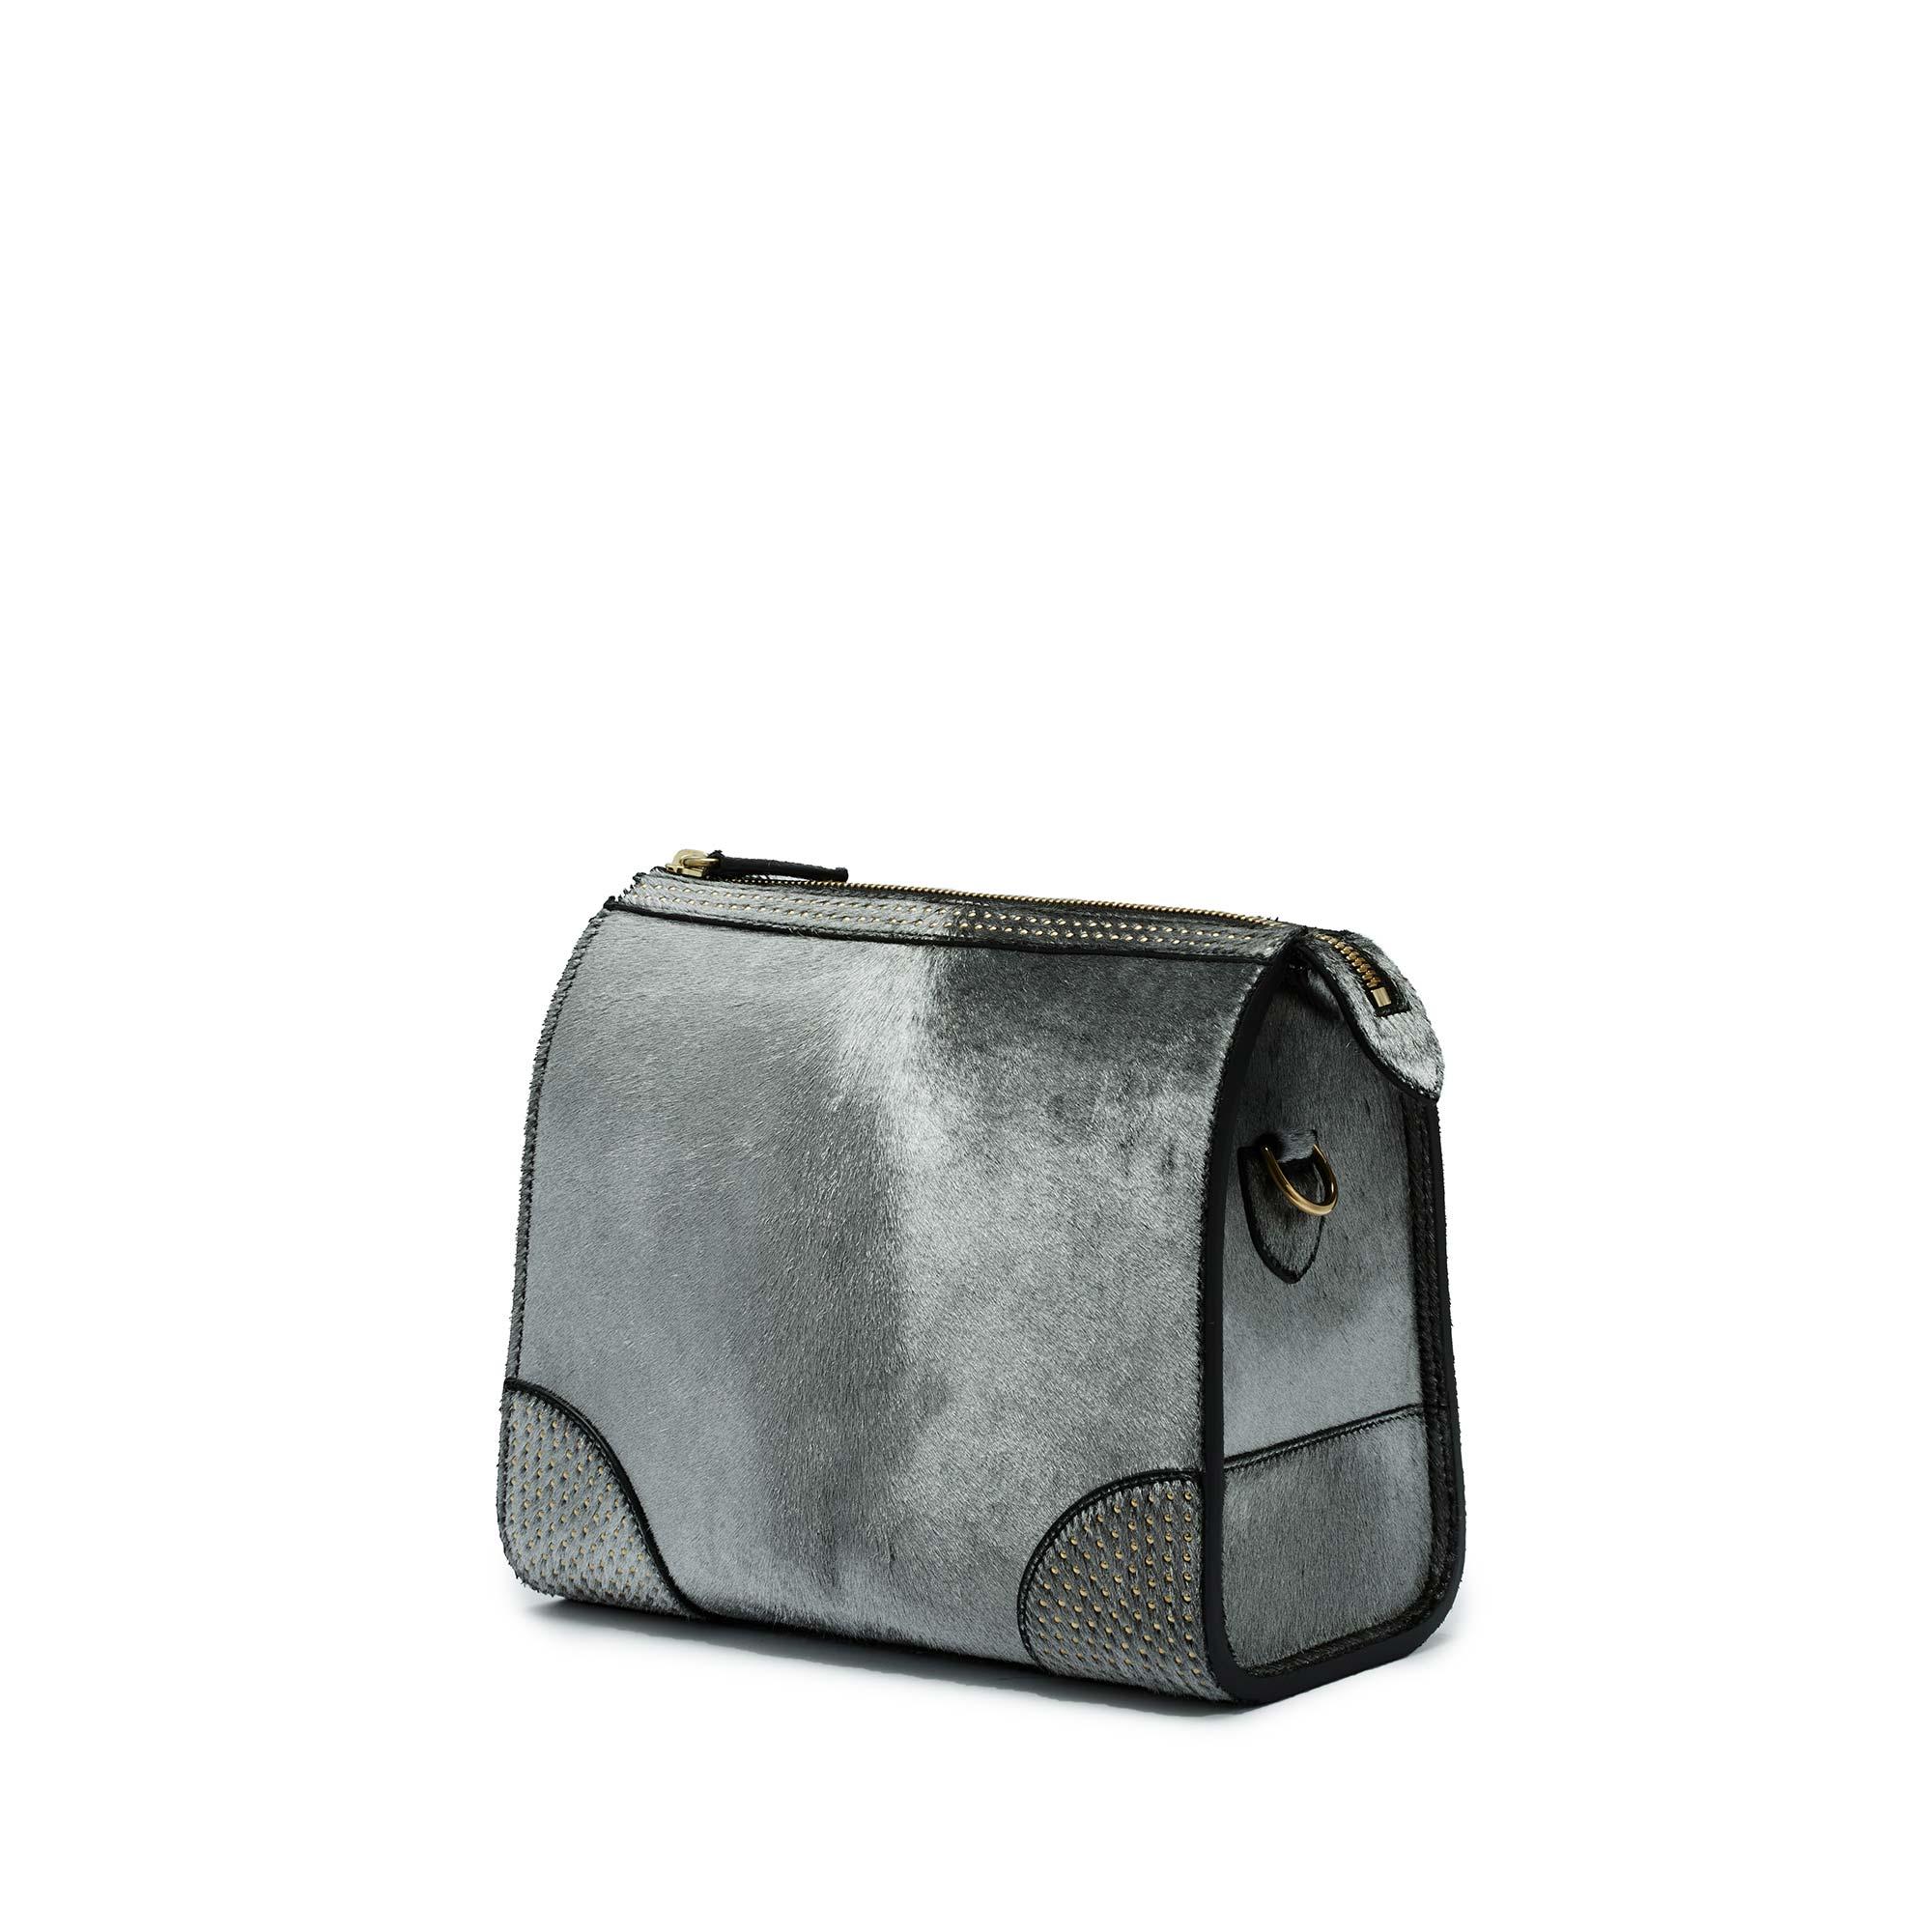 Darcy-Crossbody-silver-haircalf-bag-Bertoni-1949_01